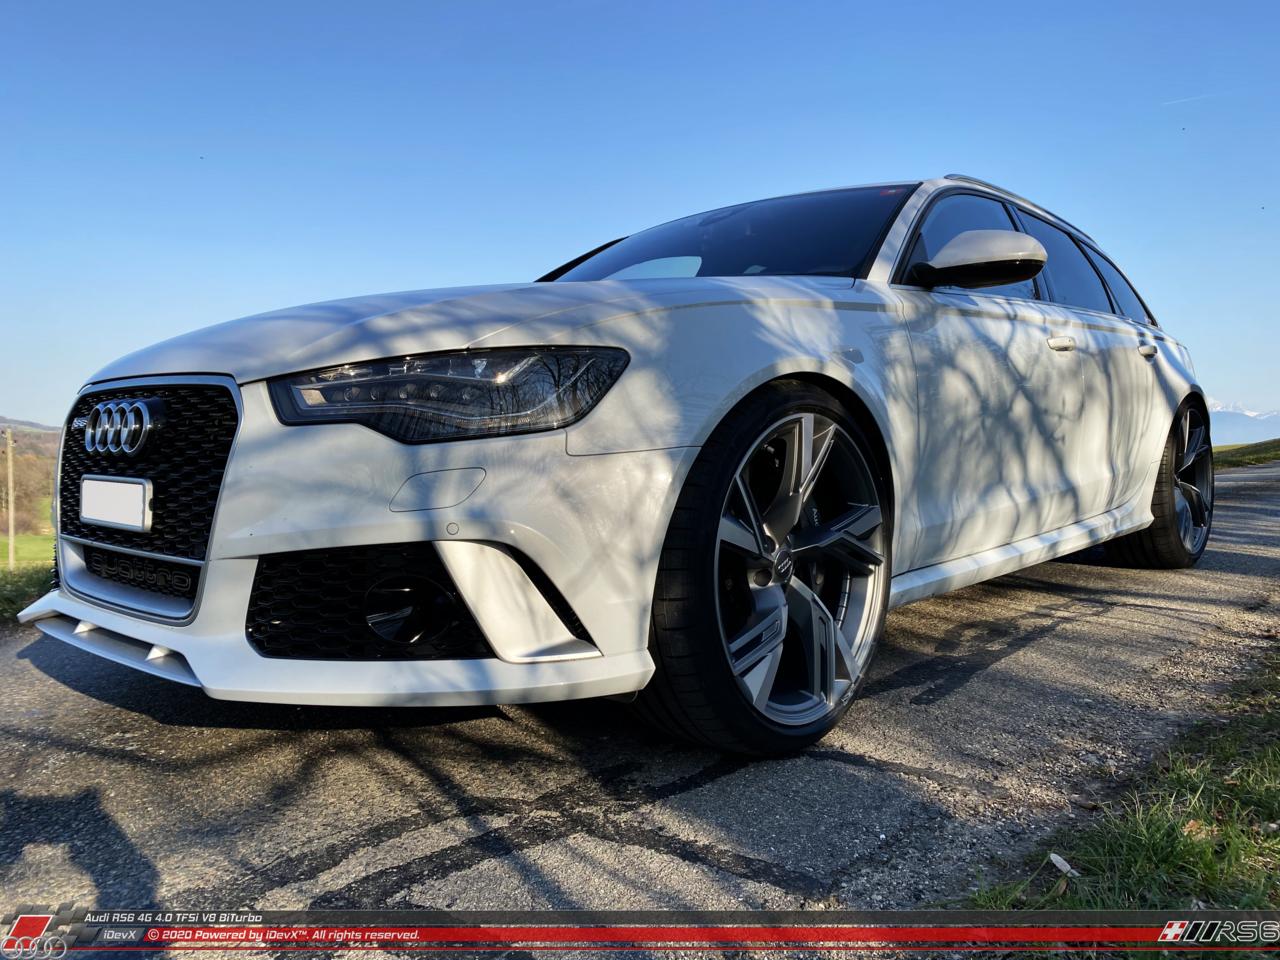 18.03.2020_Audi-RS6_iDevX_011.png